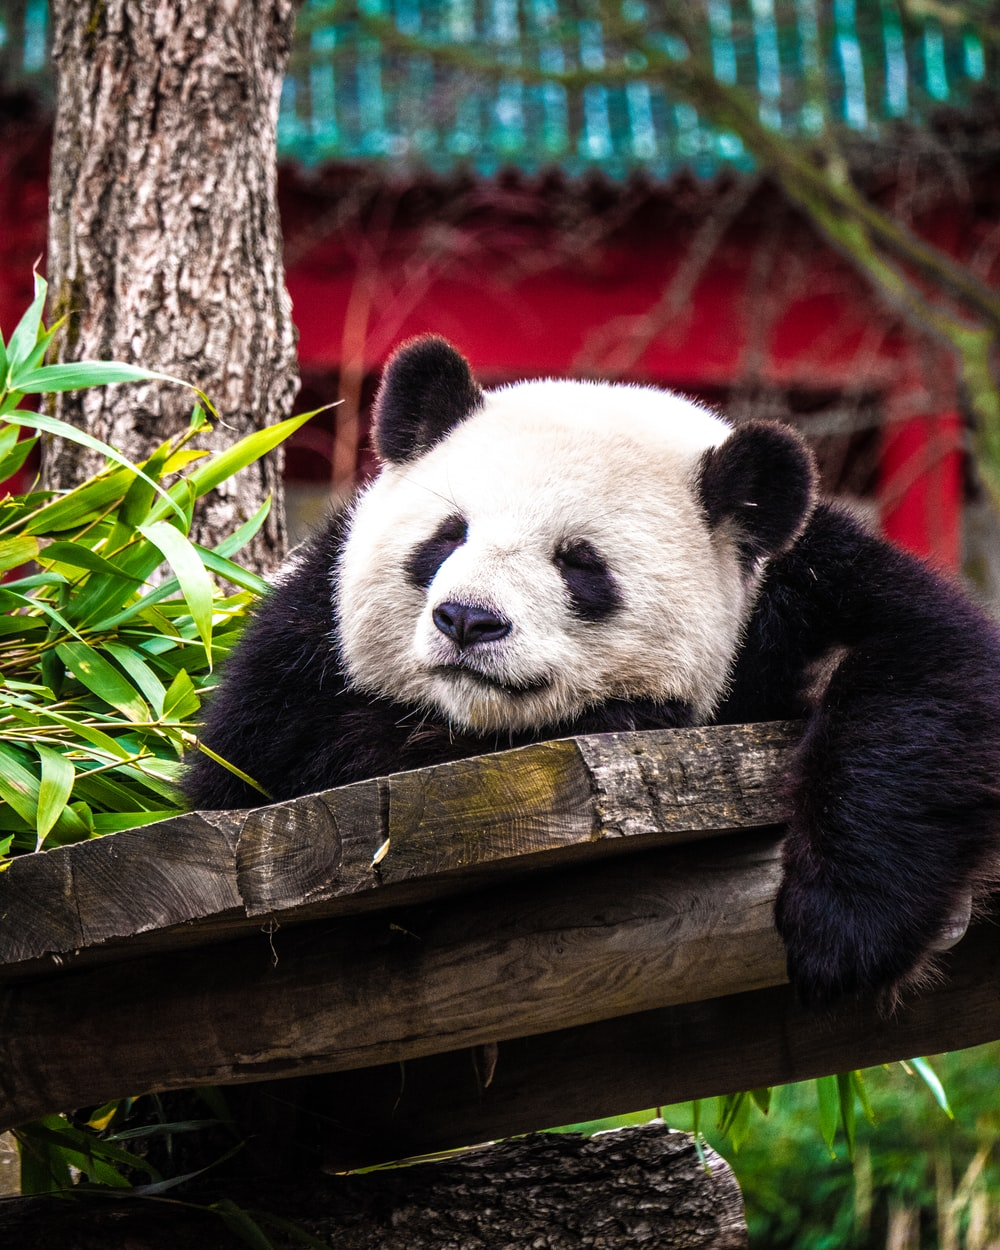 panda bear on gray plank near green plant